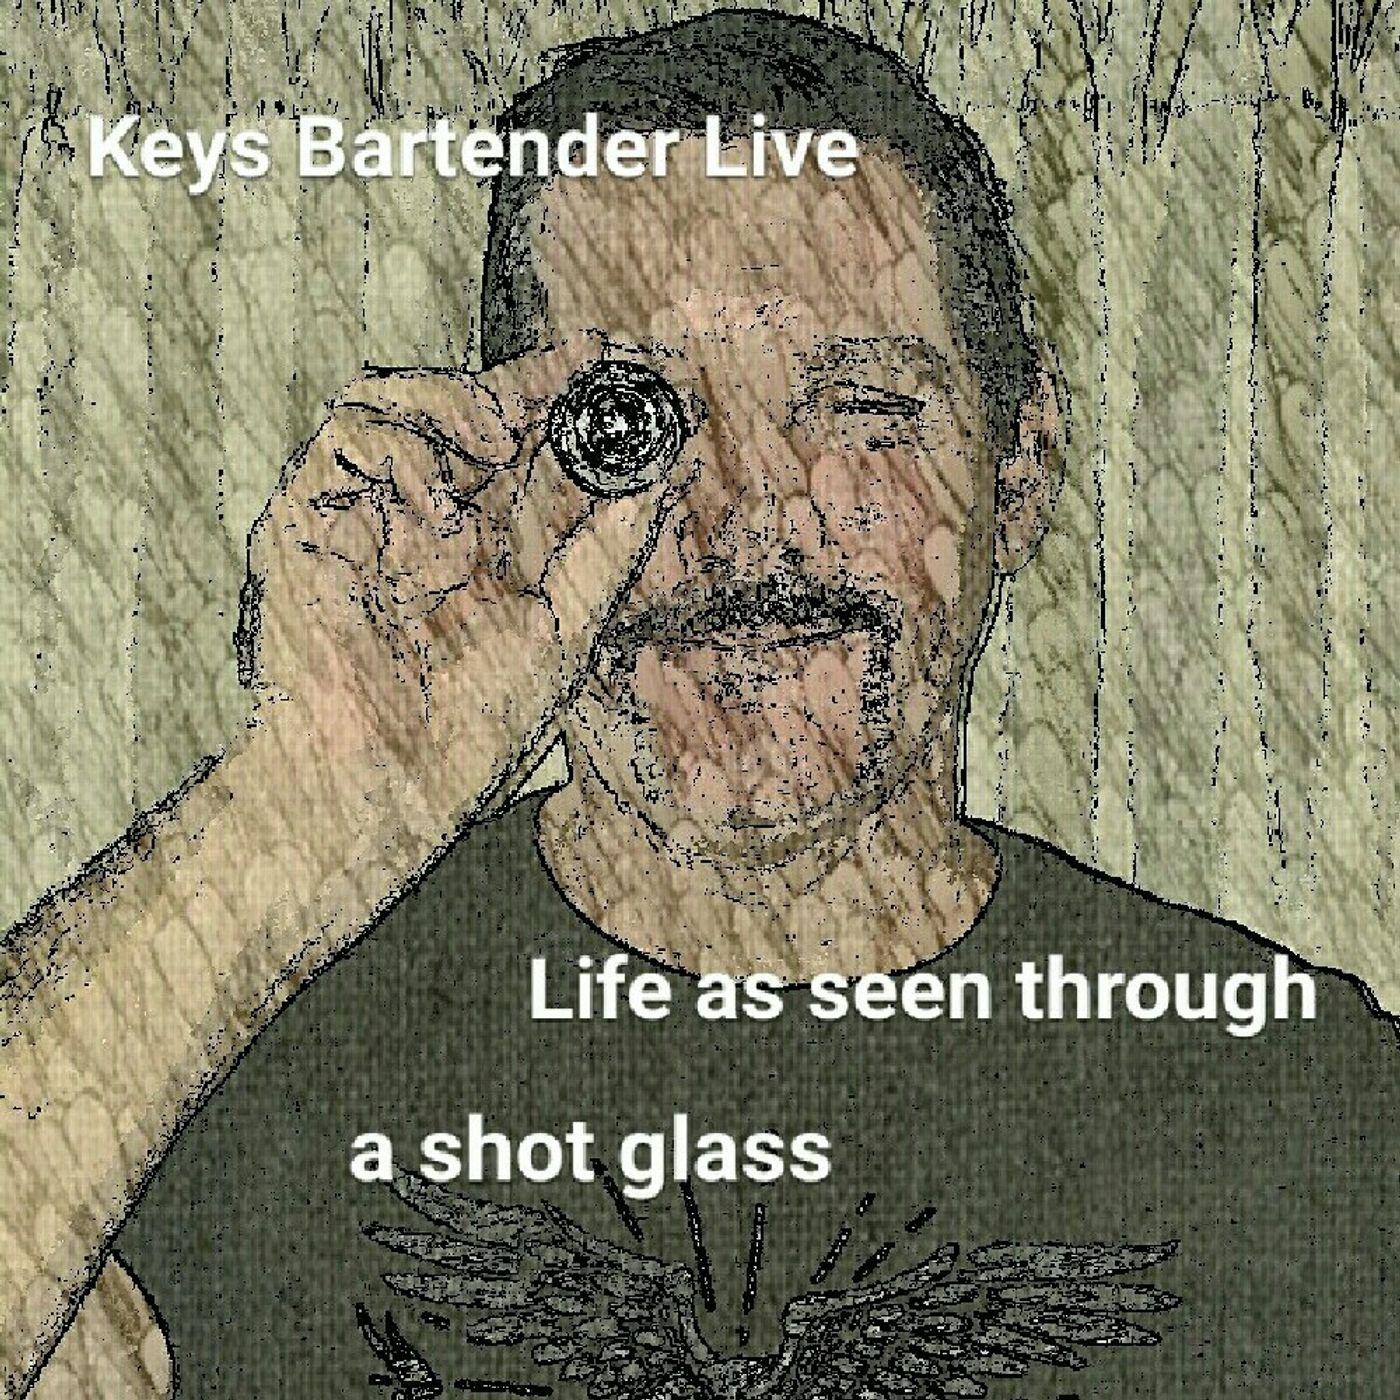 Keys Bartender